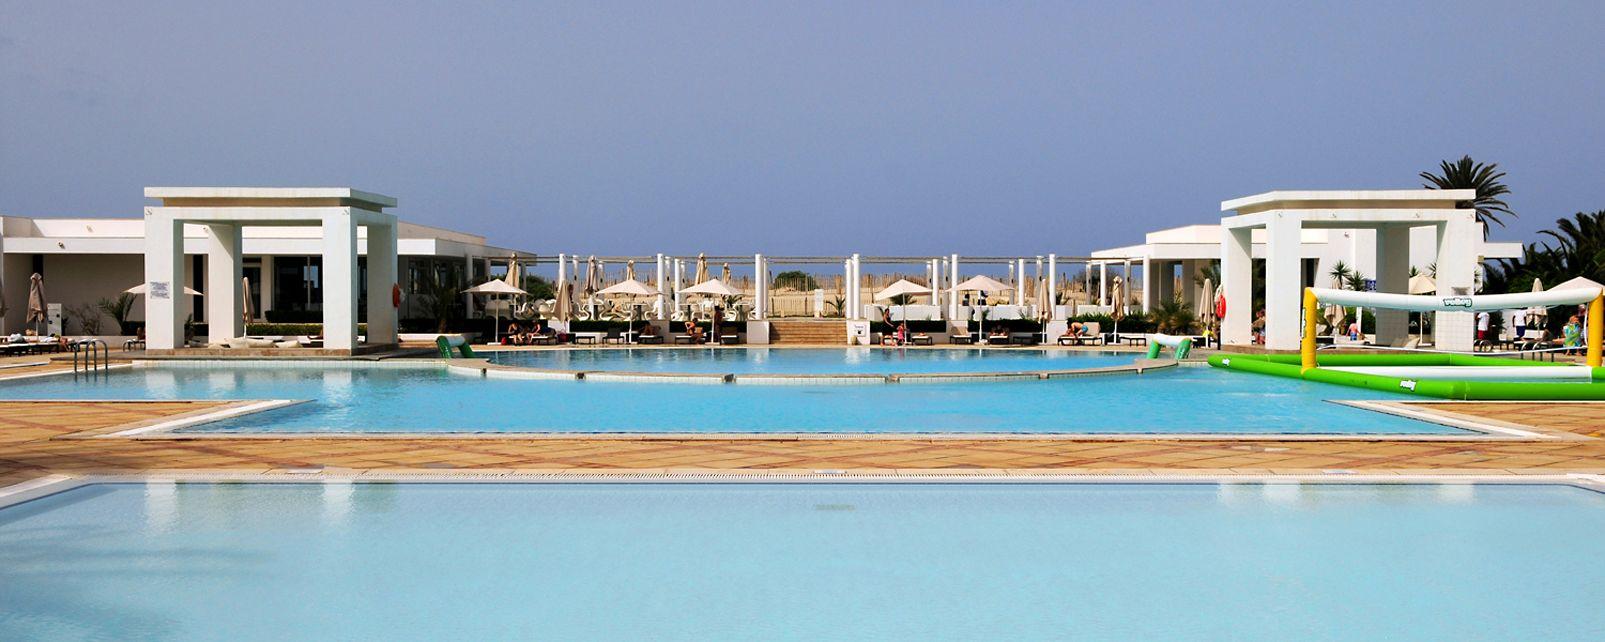 Radisson Blu Palace Resort & Thalasso 5 звезд